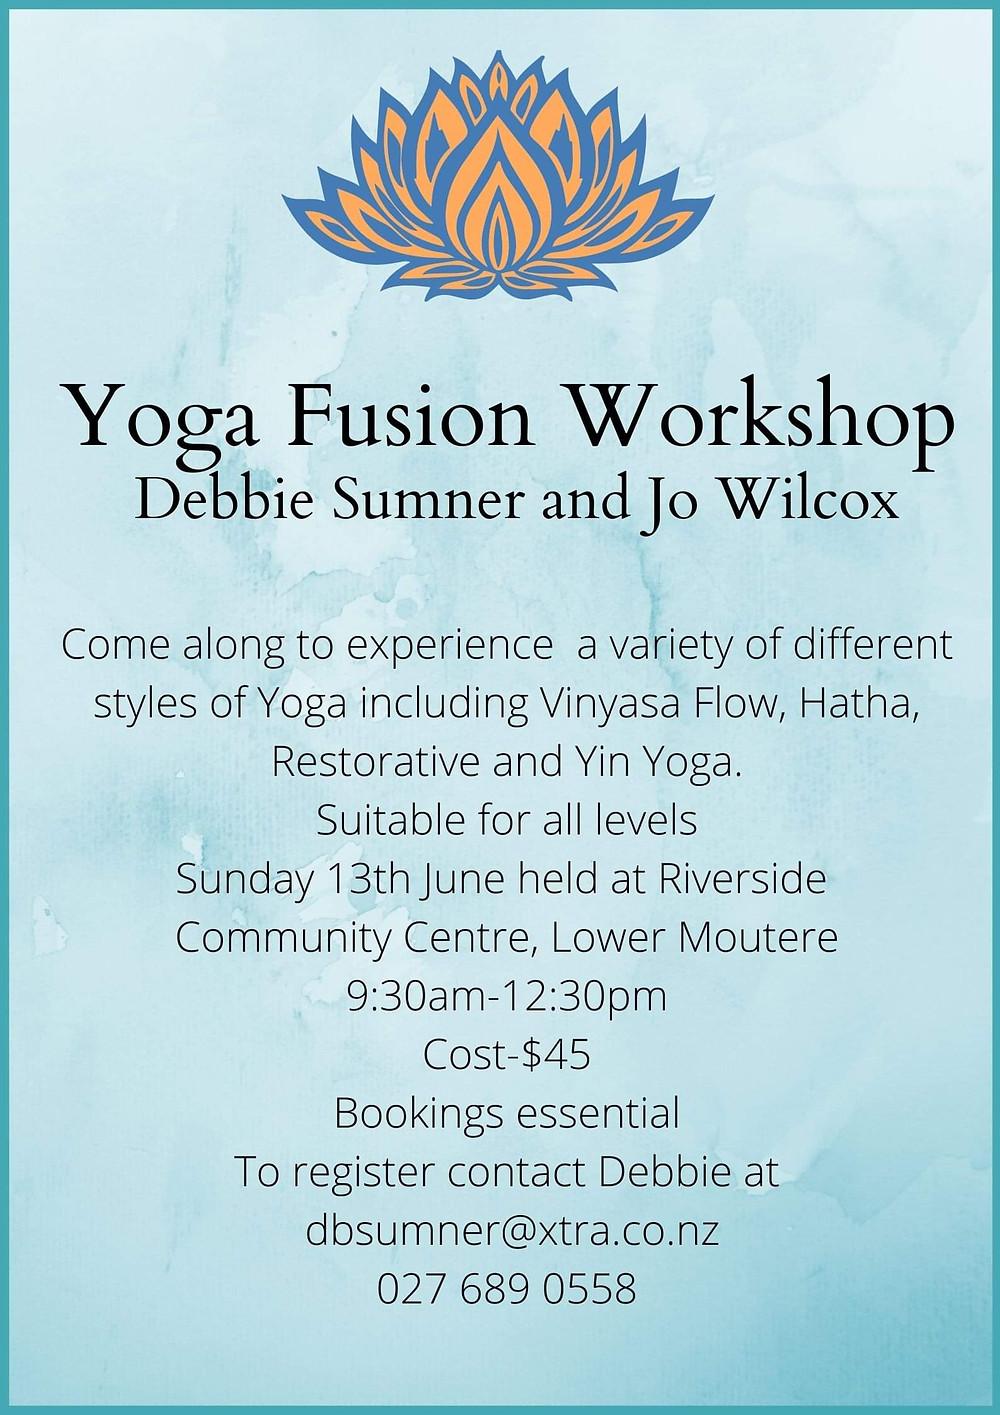 Yoga Fusion Workshop Poster